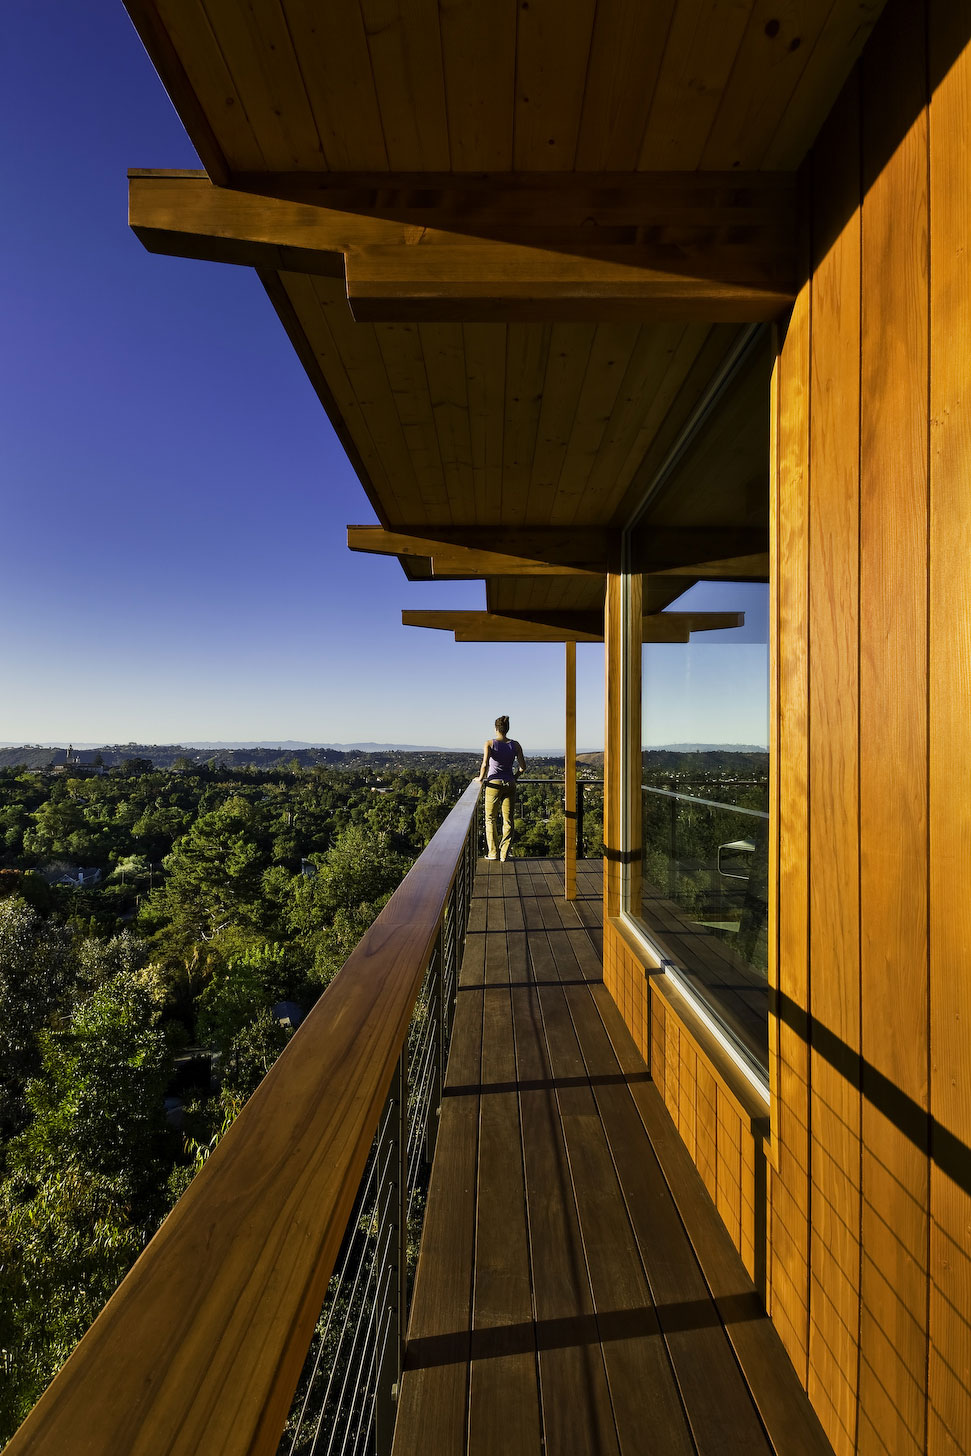 Wooden Balcony, Mid-Century Modern Home in Santa Barbara, California